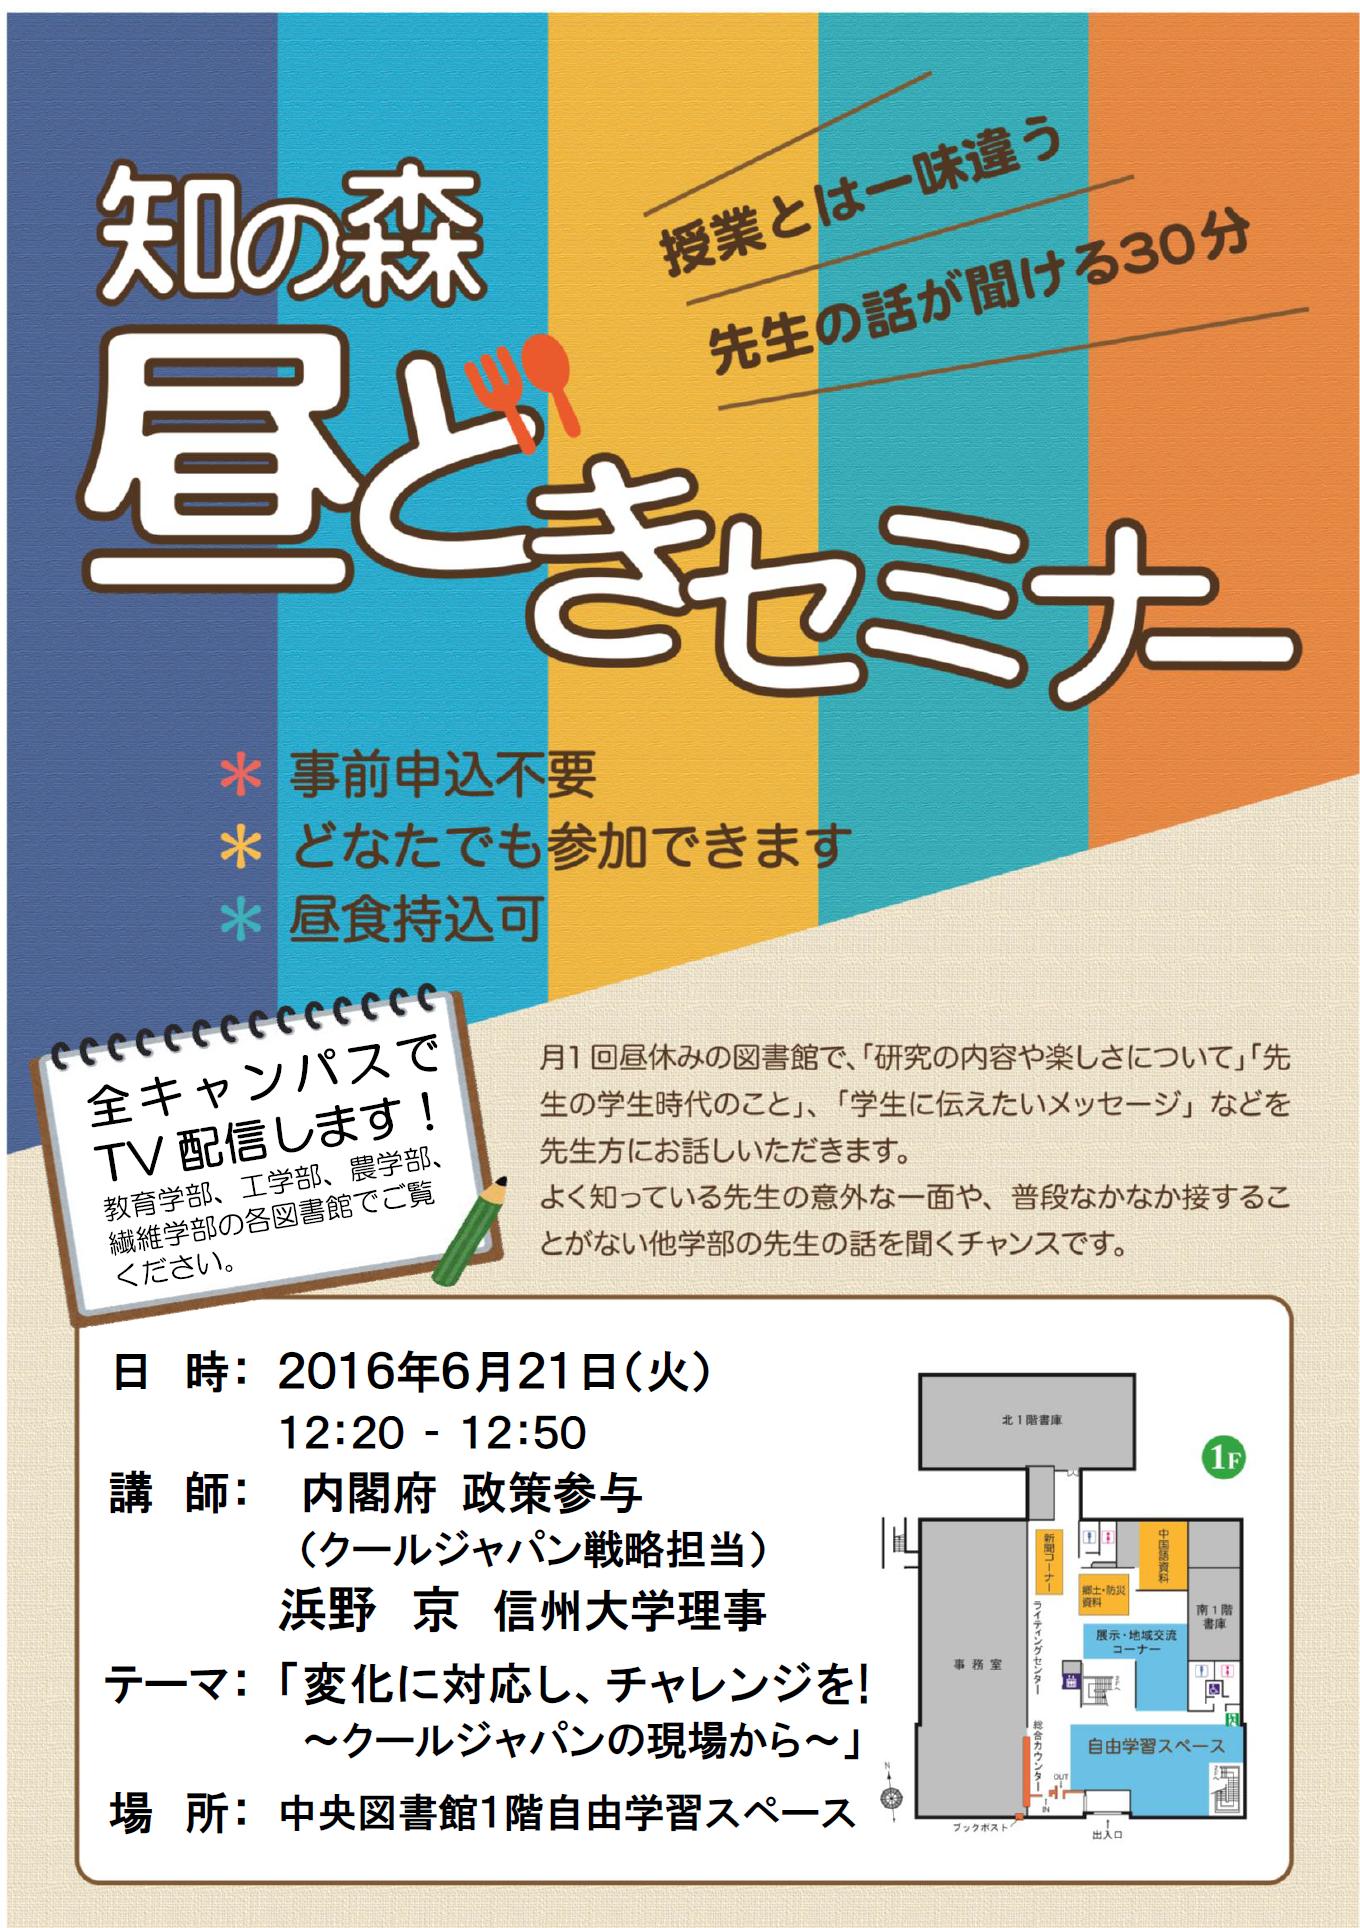 http://www.shinshu-u.ac.jp/institution/library/matsumoto/uploadimg/385f142b505d832f085e8f5619e0f26b.png